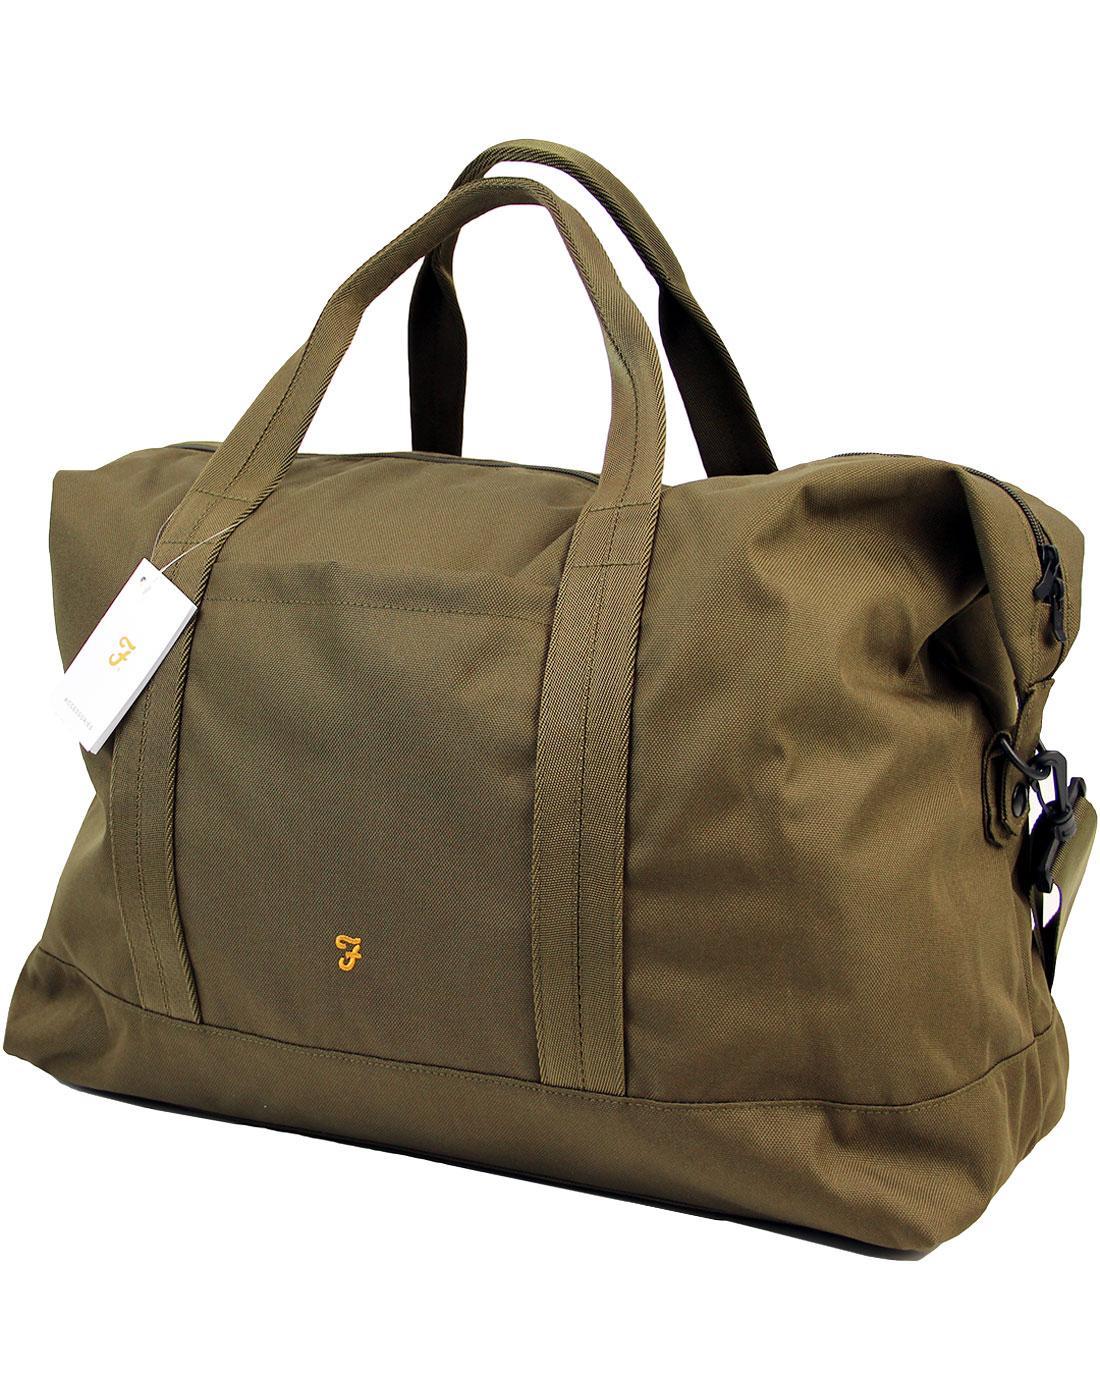 Franks FARAH Retro Military Weekend Bag GREEN